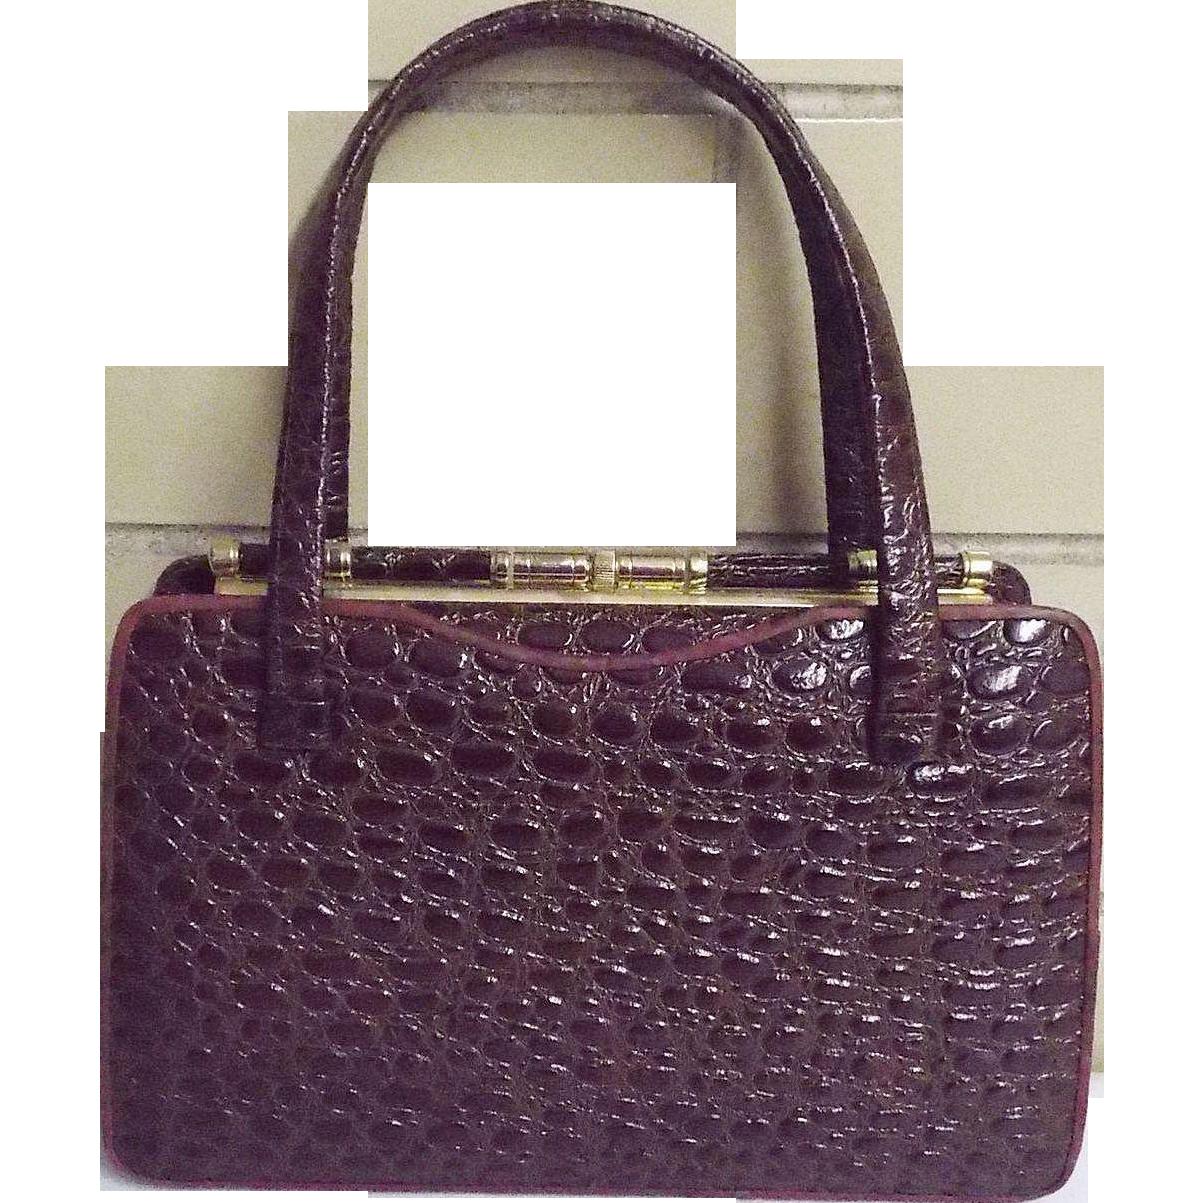 Brown Embossed Leather Faux Alligator Design Stand-UP Handbag